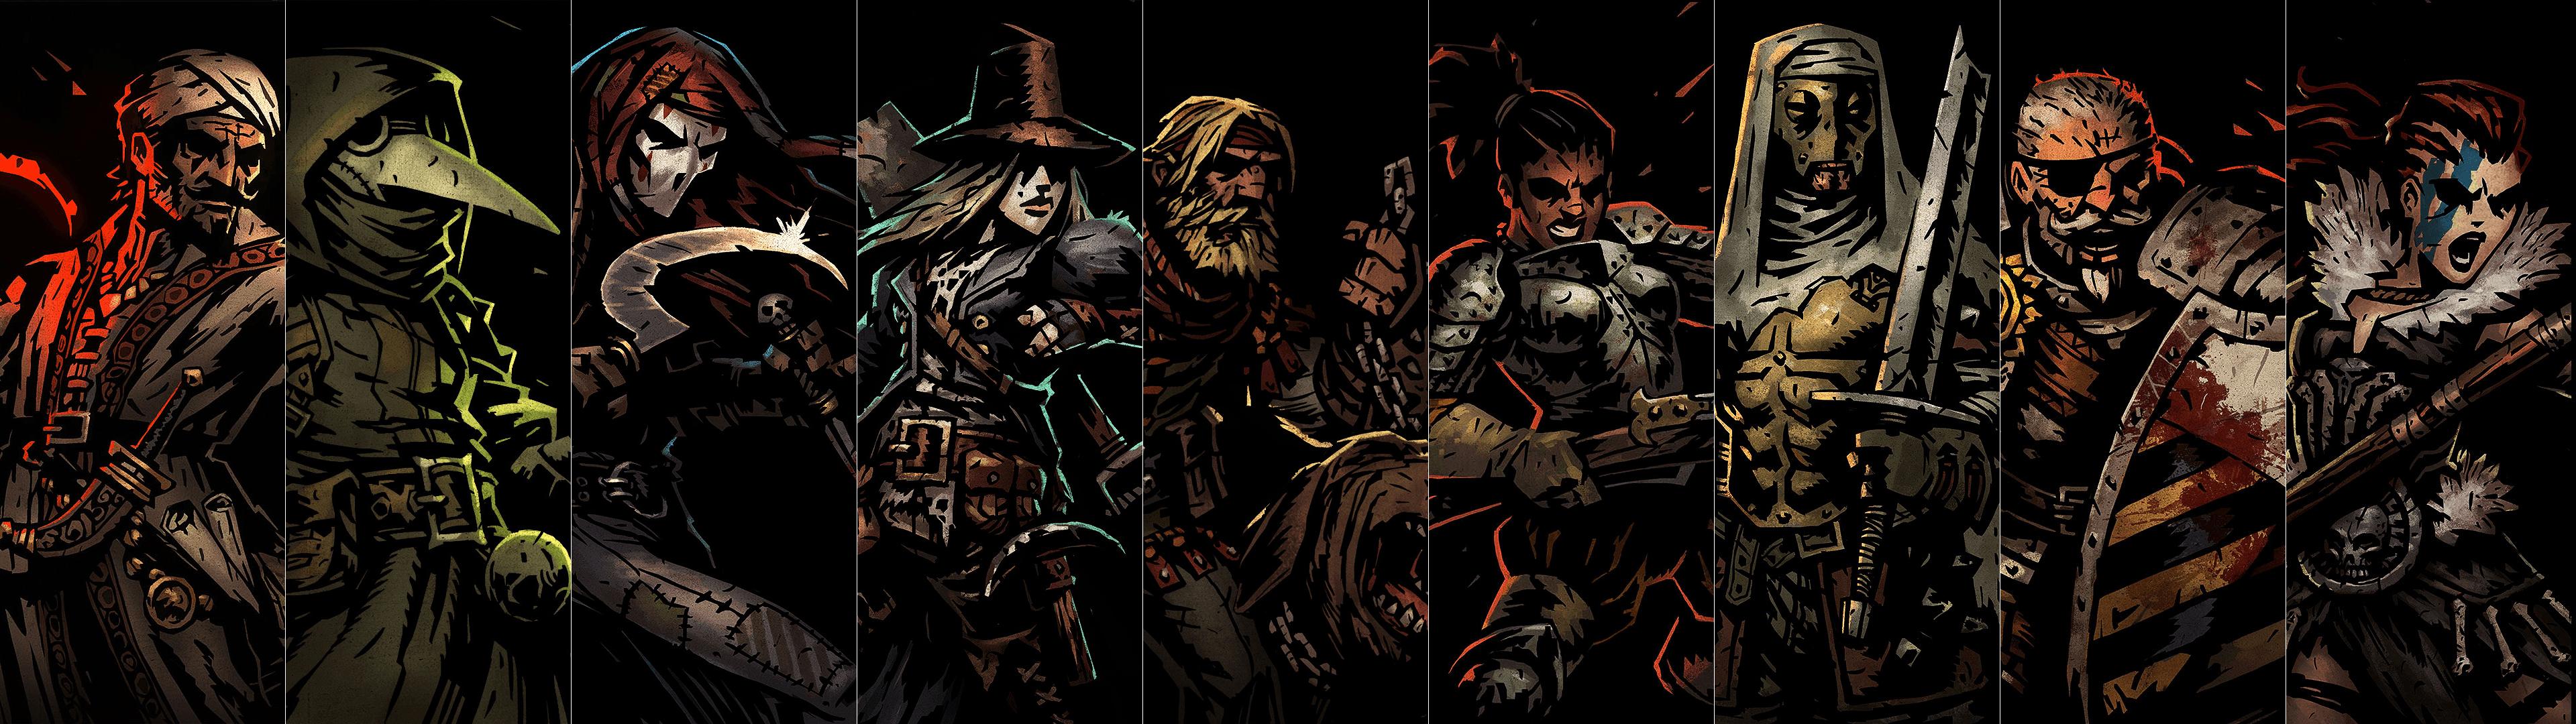 Darkest Dungeon Wallpapers - Wallpaper Cave